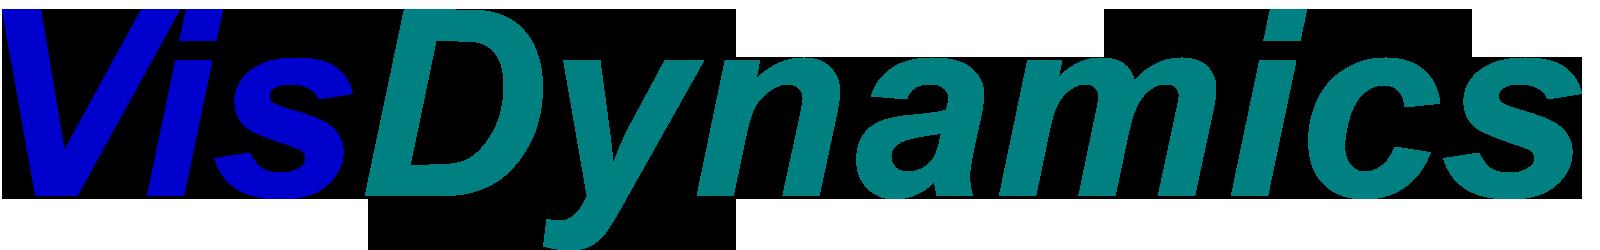 Image result for visdynamics